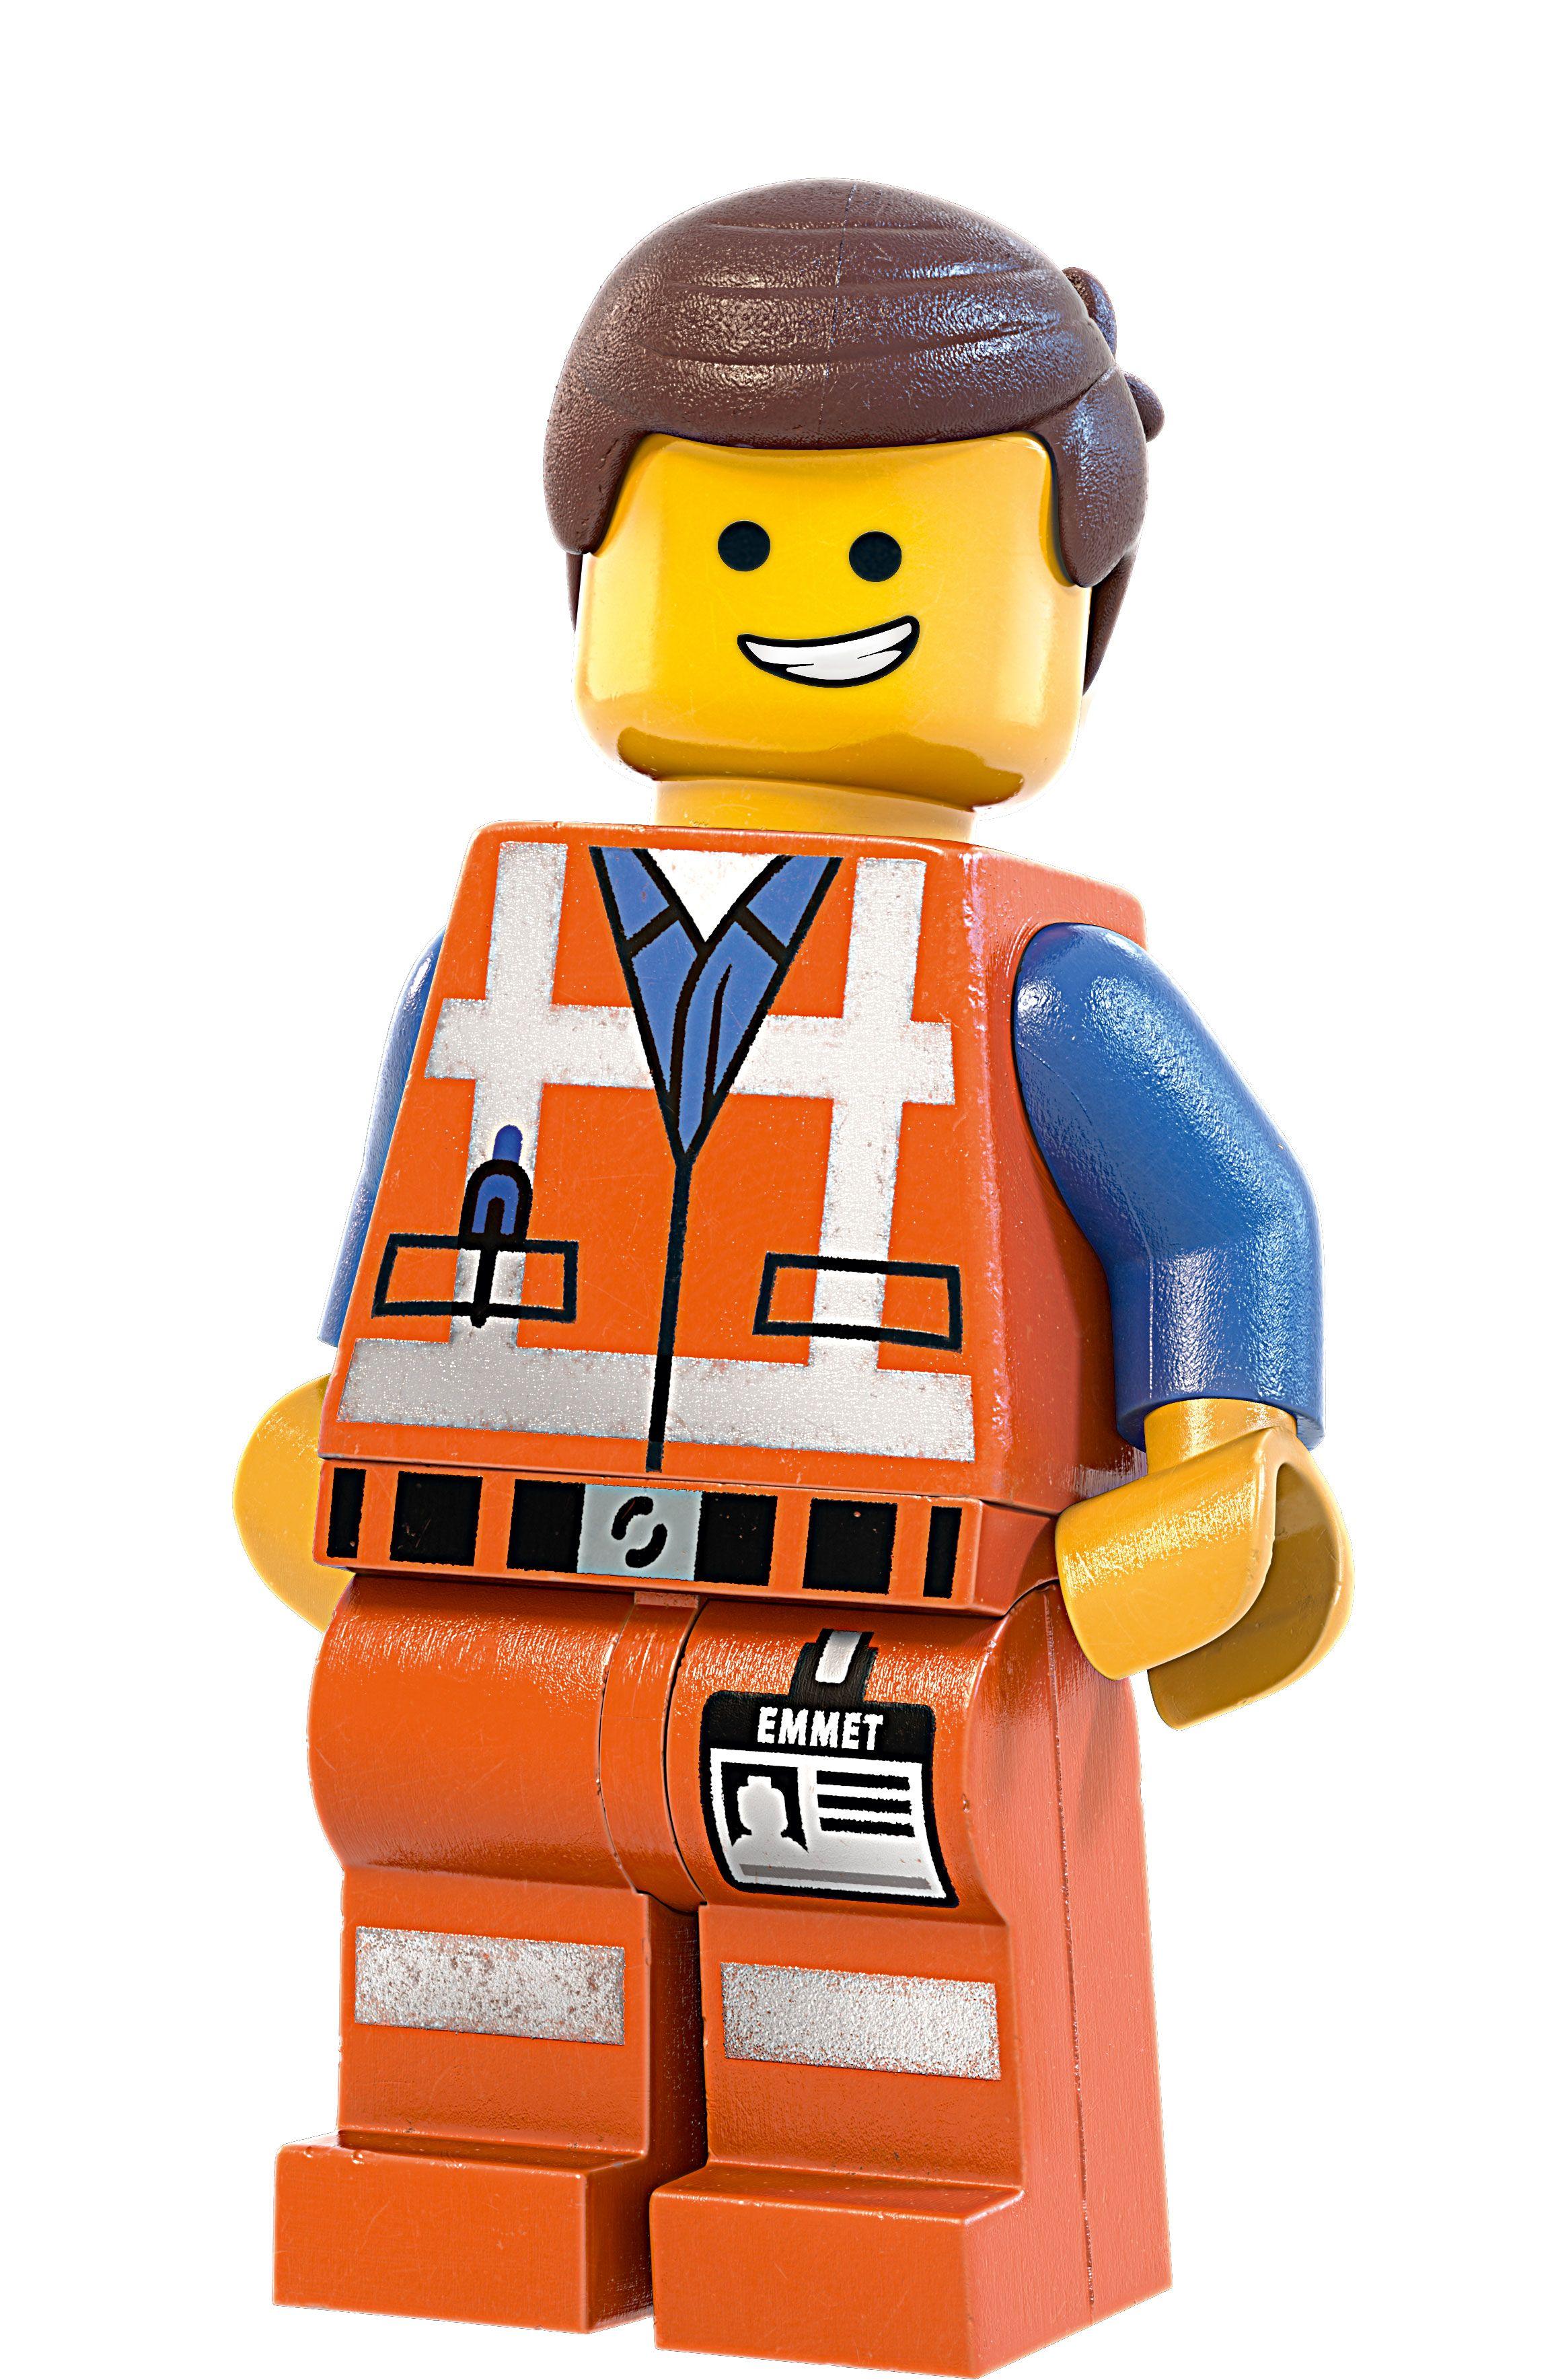 Emmet lego movie lego pinterest emmet en la pelcula de lego voltagebd Gallery